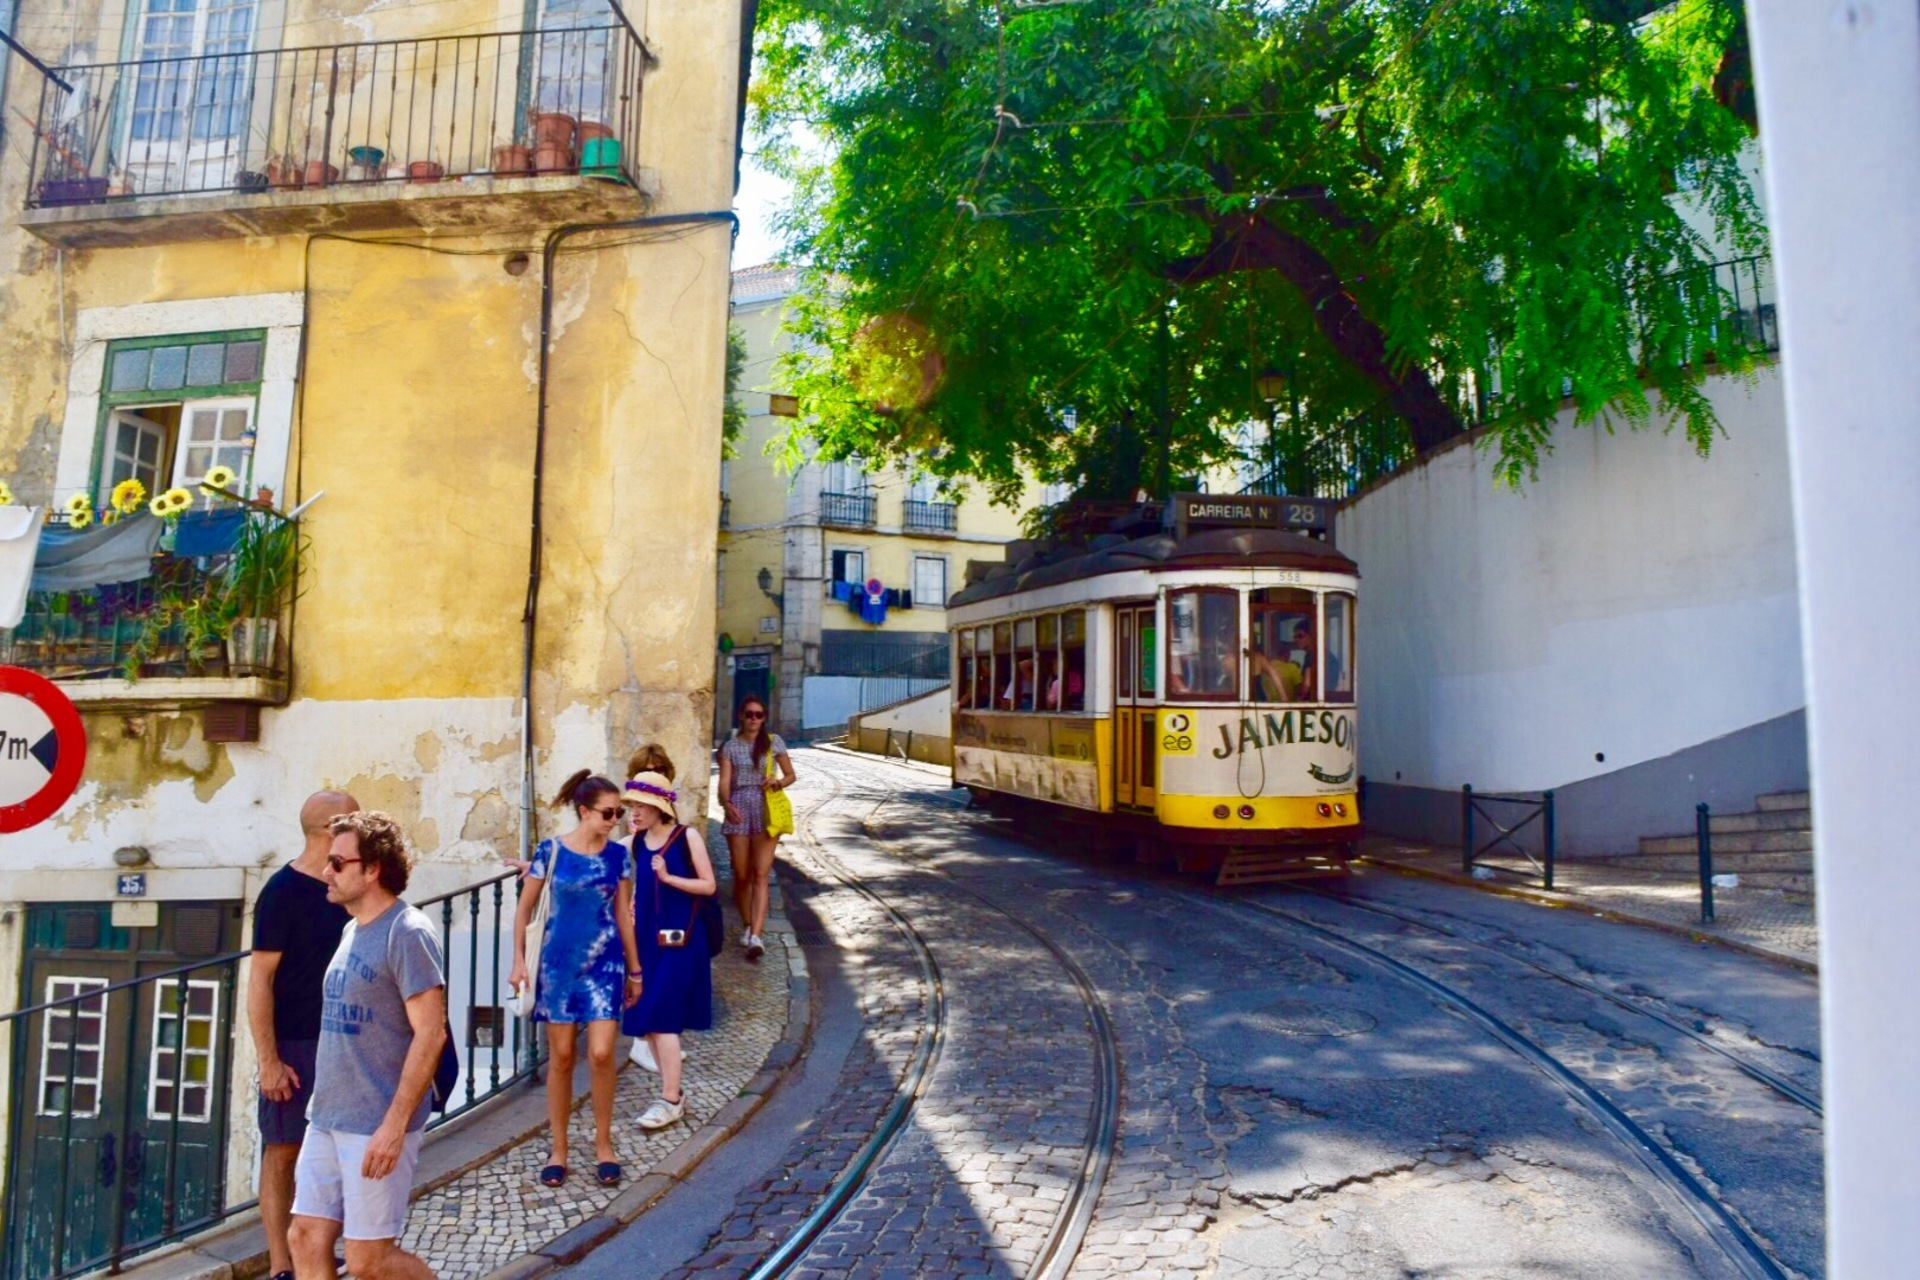 Urban streets of Lisbon